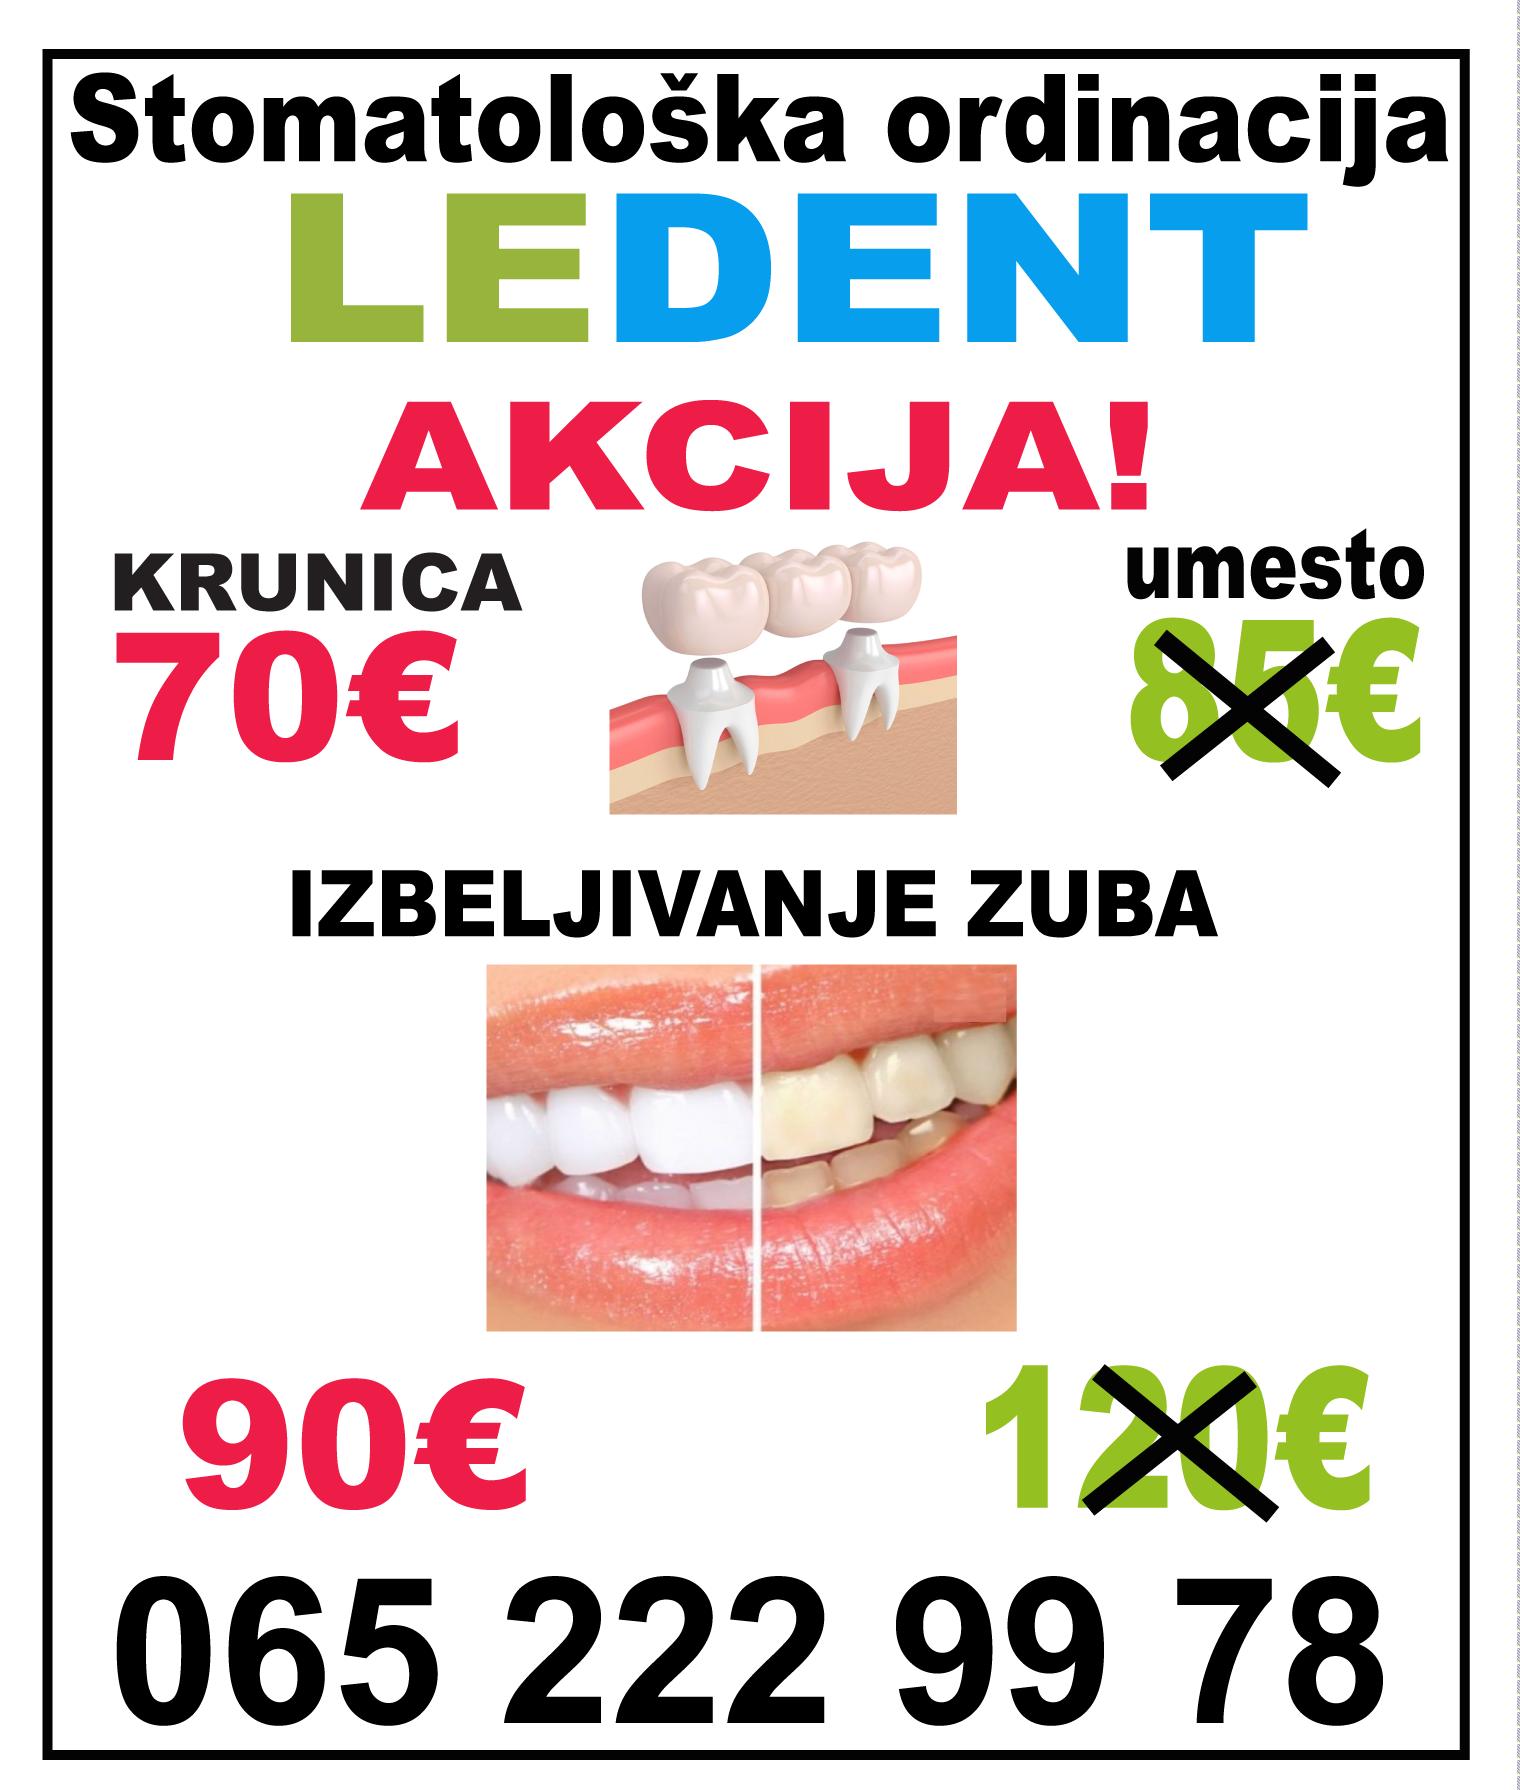 Ledent ledine stomatolog zubar novi beograd surcin vojvodjanska popravka proteza zub implant ugradnja proteze krunica plomba mojabaza1